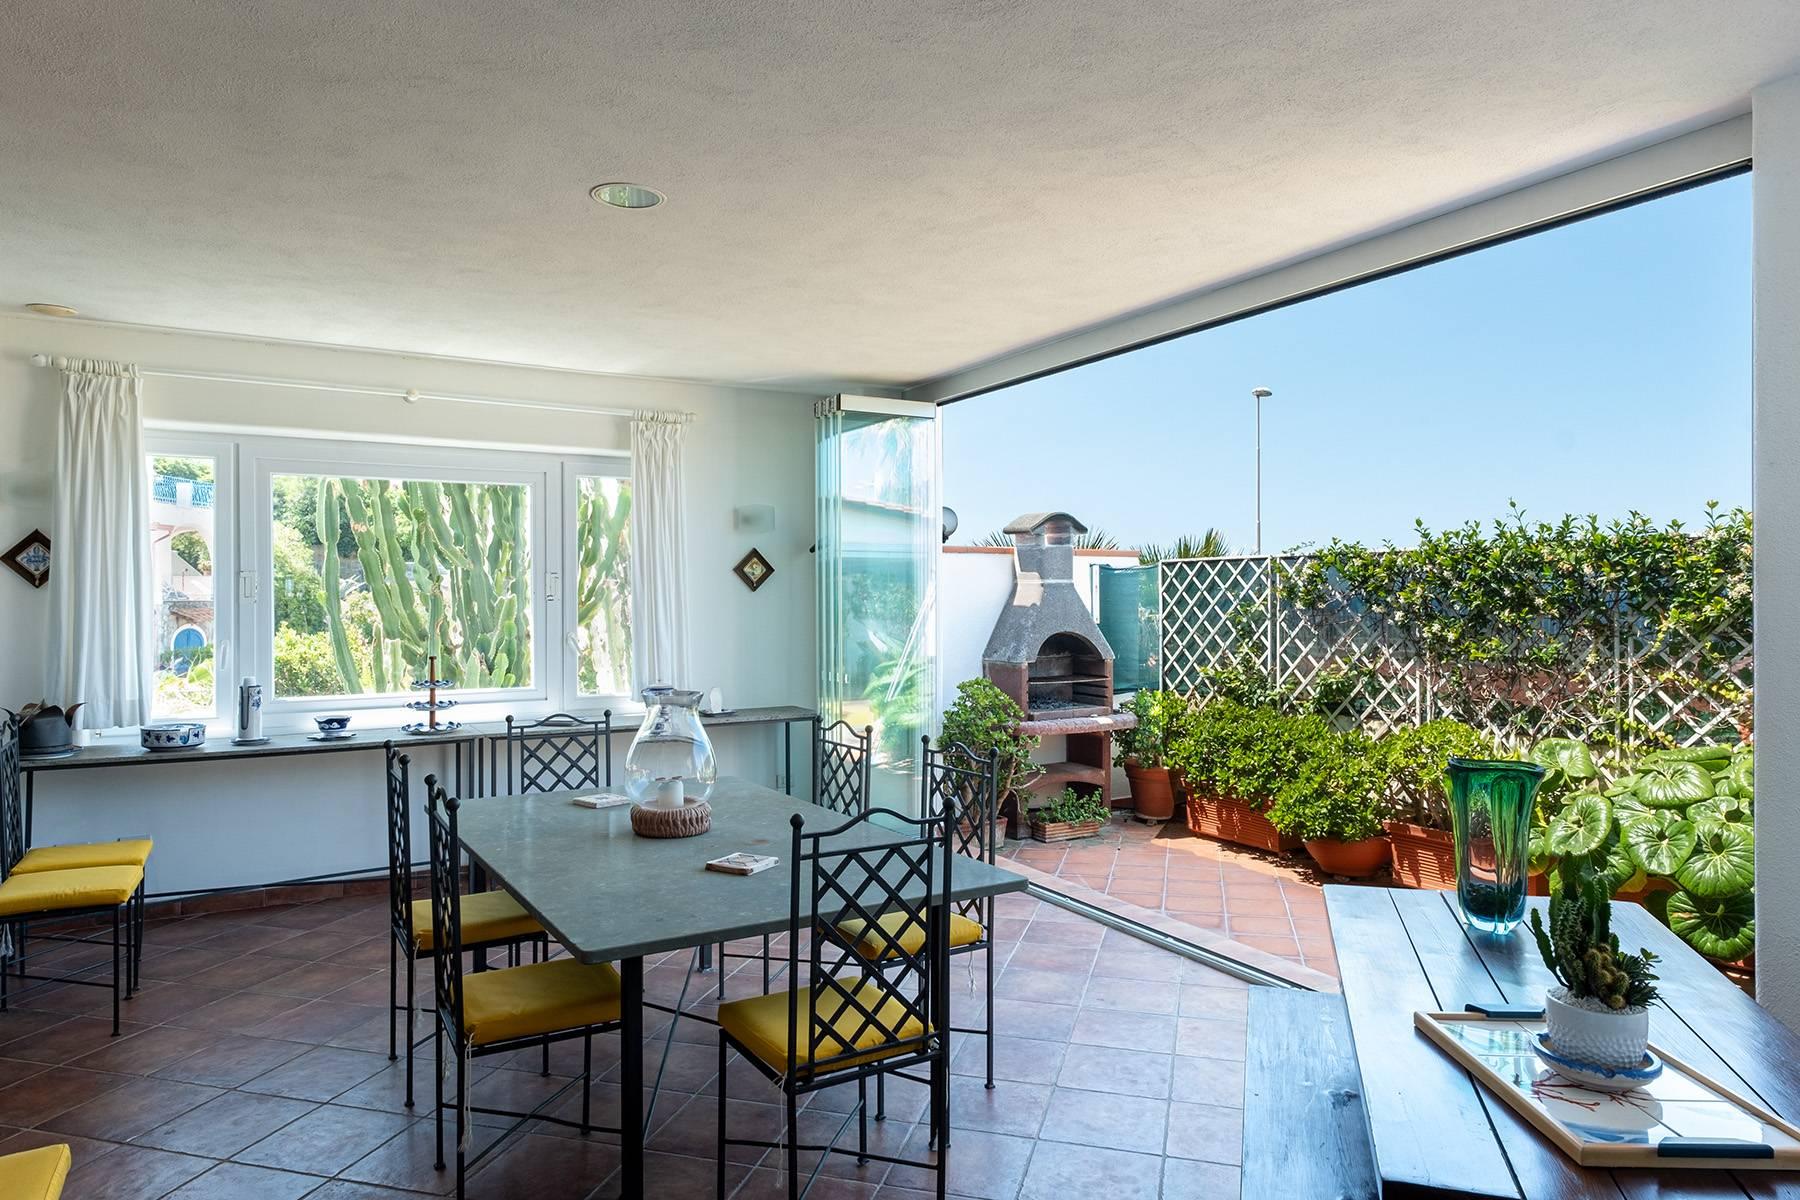 Villa in Vendita a Ischia: 5 locali, 400 mq - Foto 3